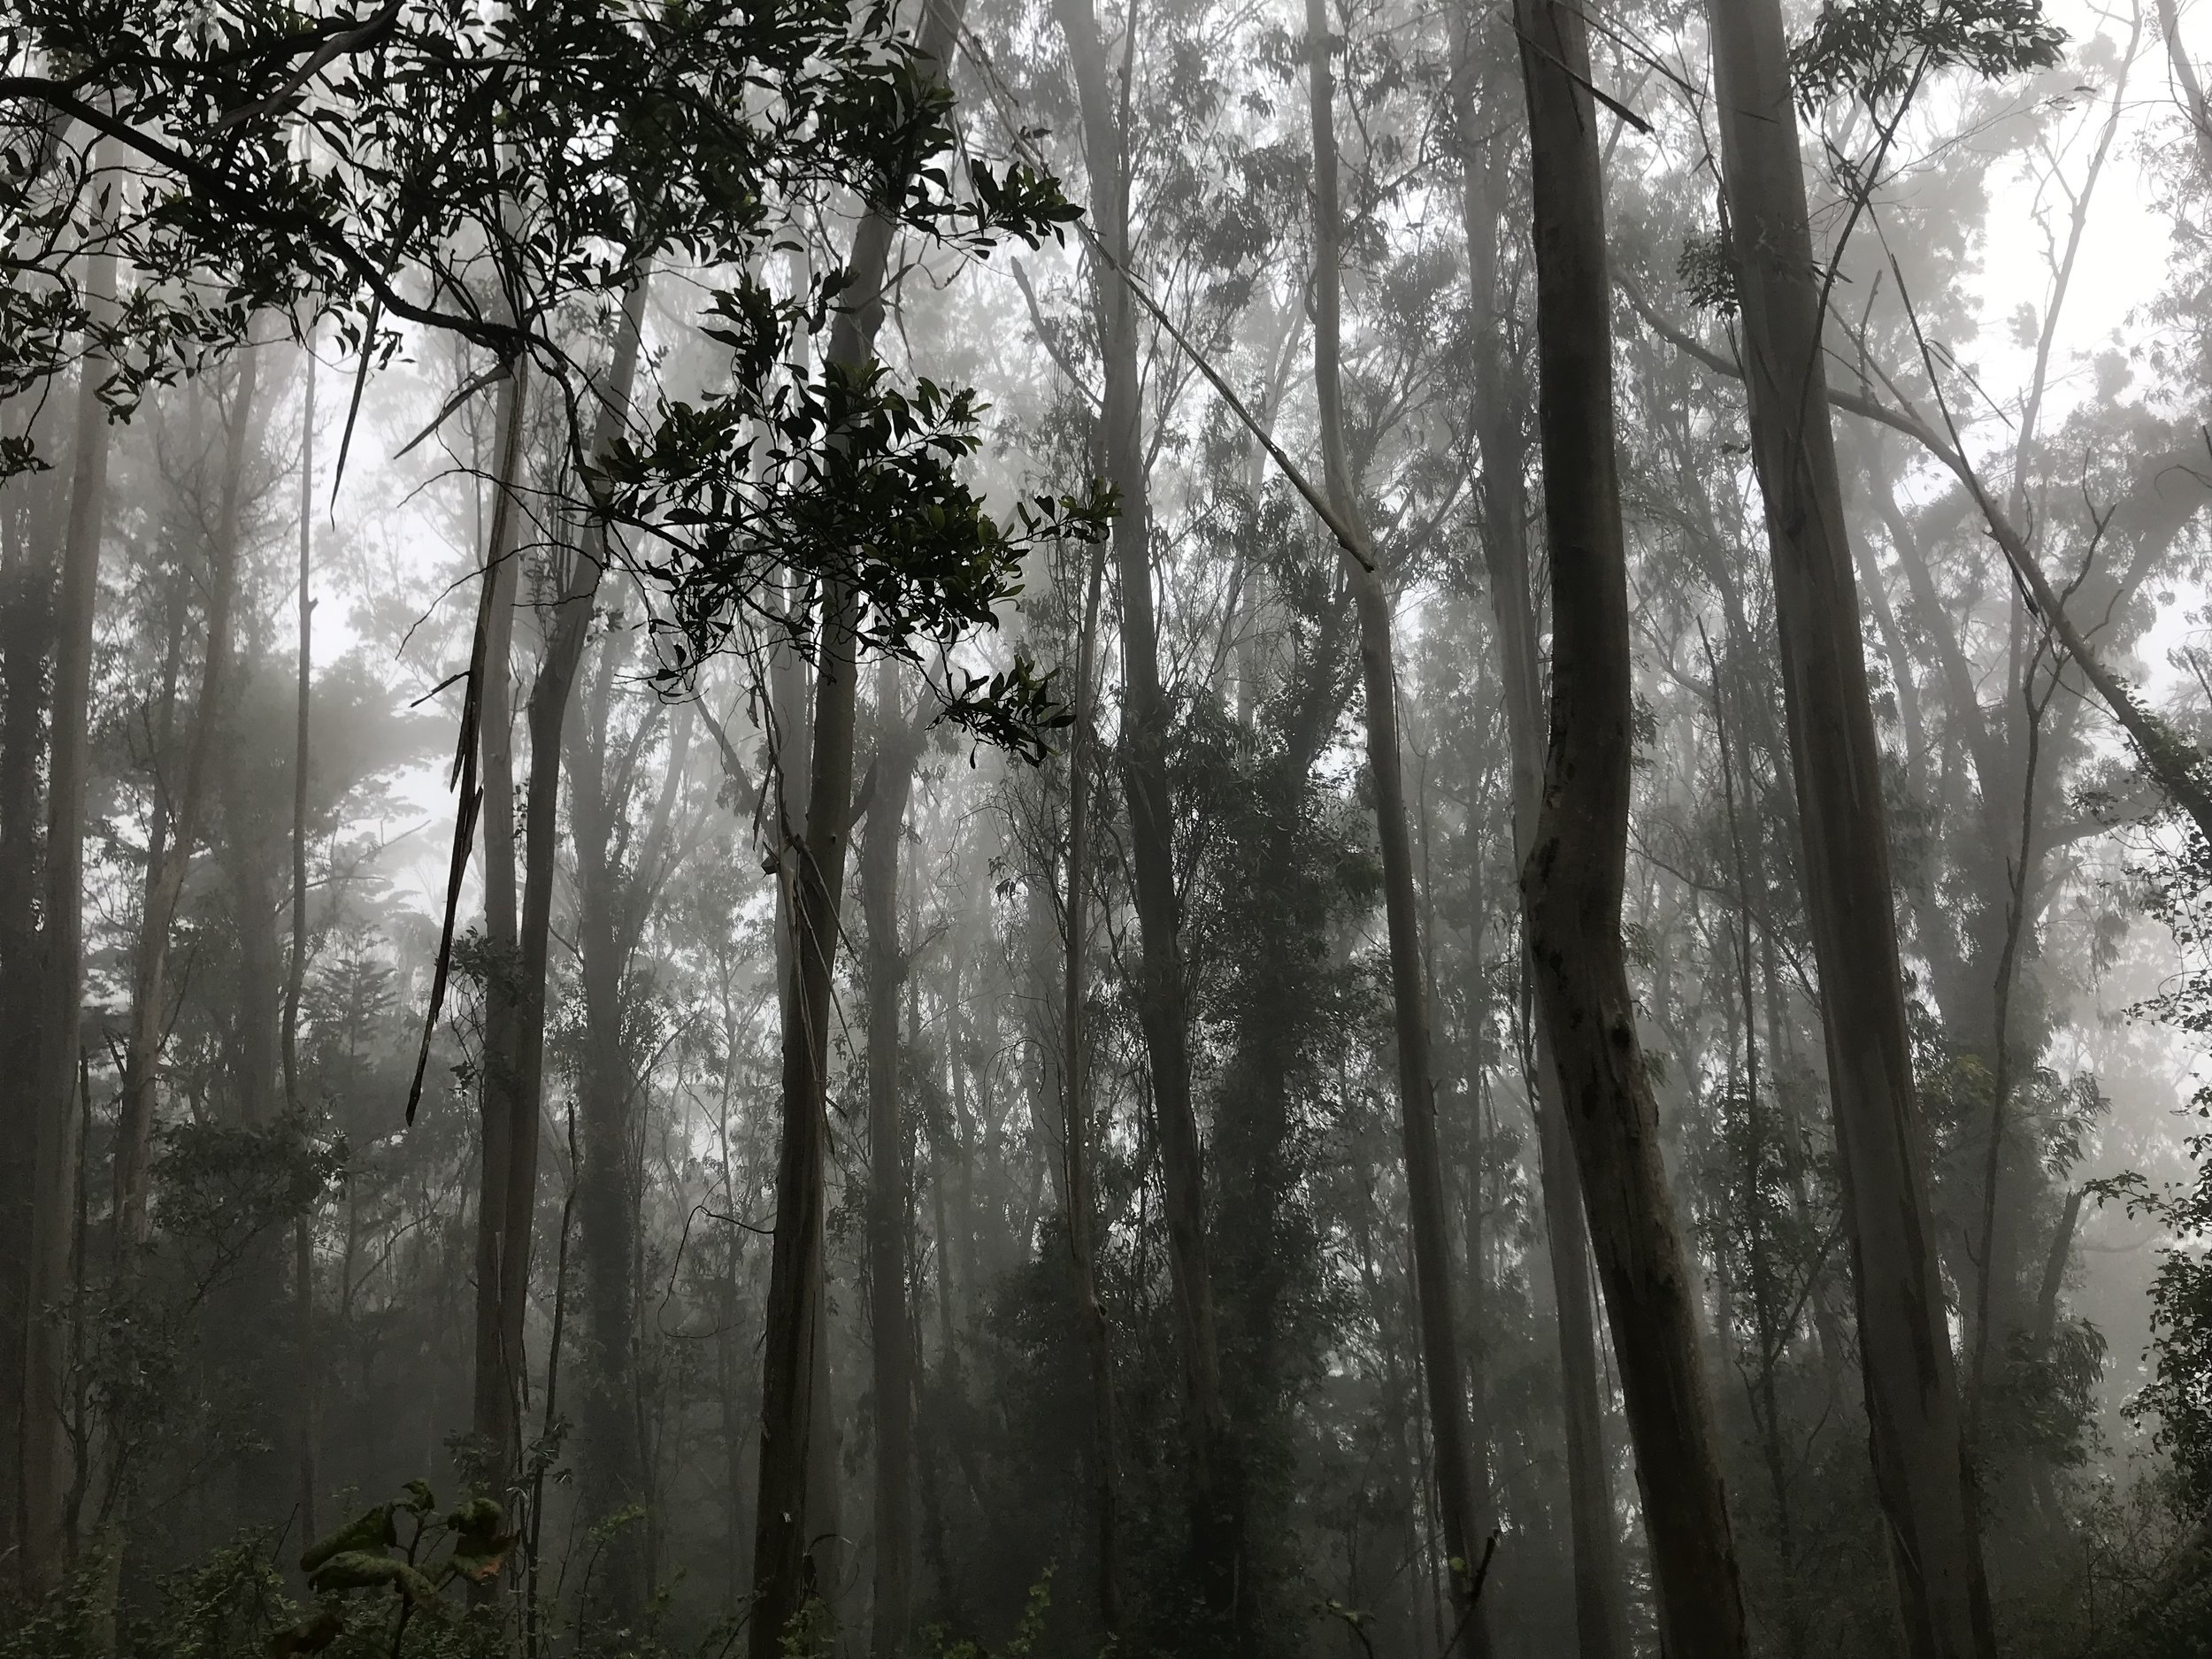 Trees through the fog at Mount Sutro today.